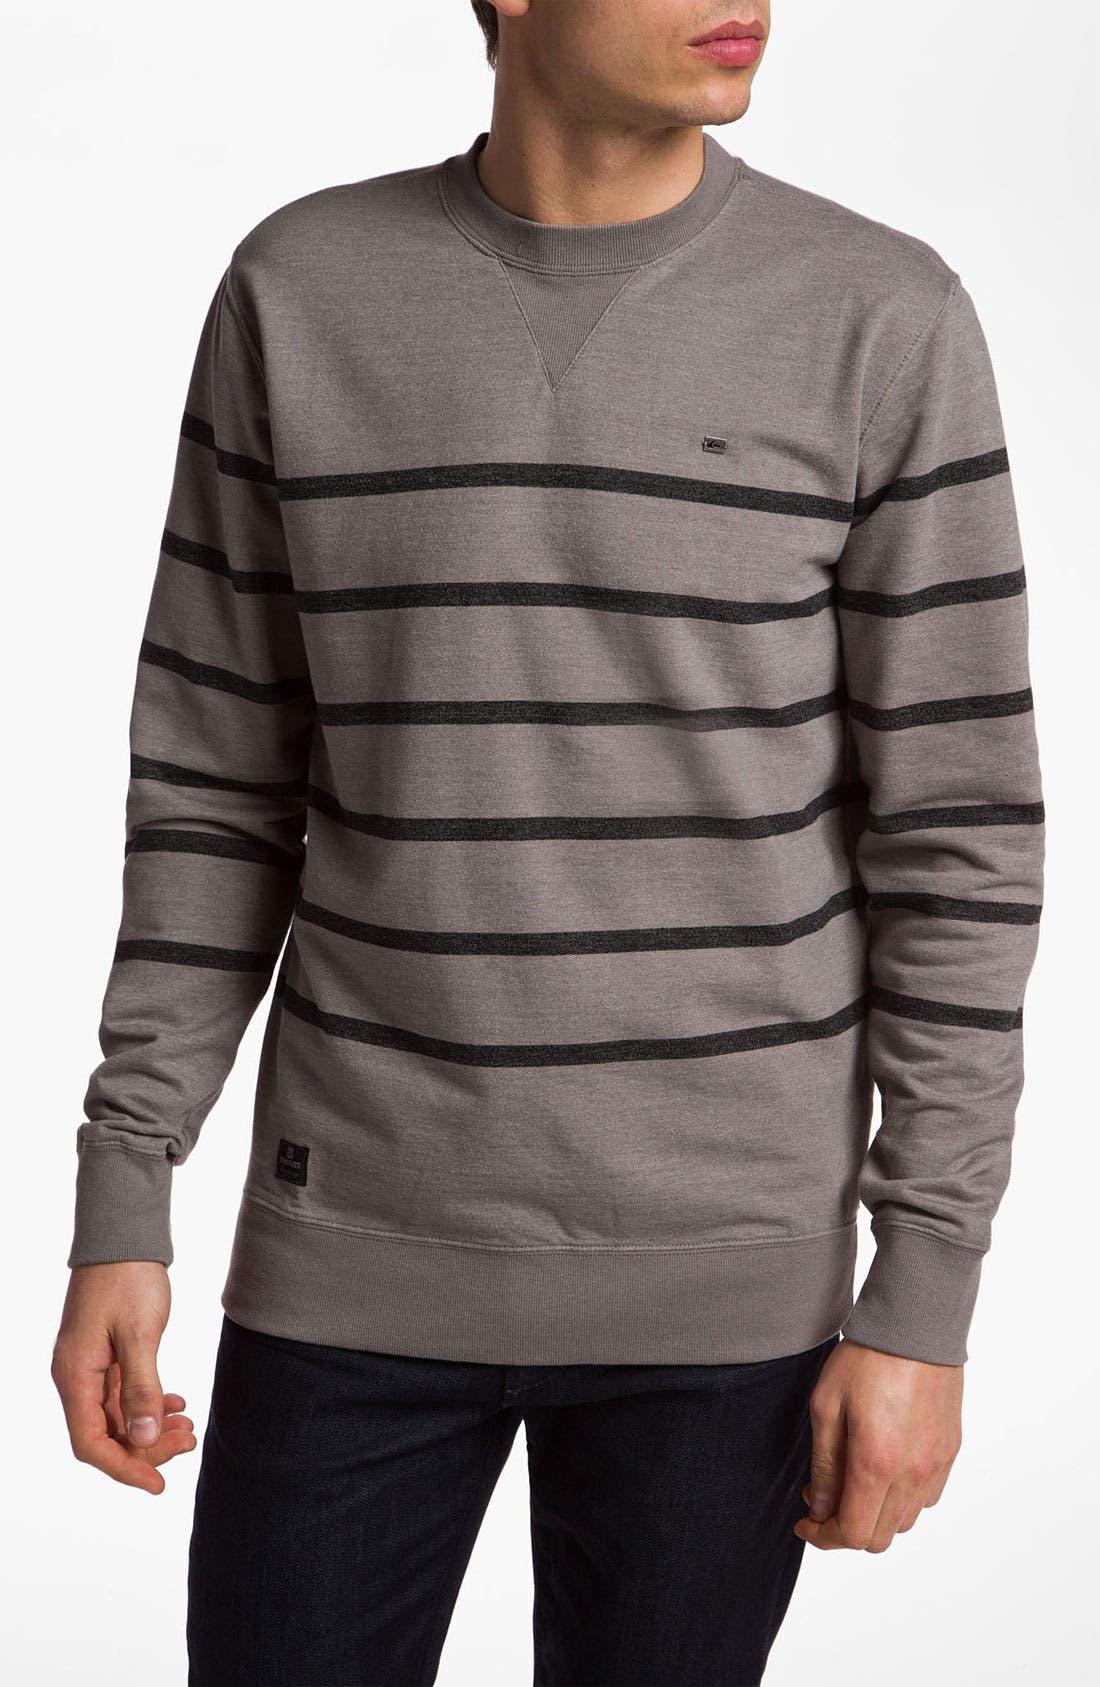 Alternate Image 1 Selected - Quiksilver 'Malone' Crewneck Sweatshirt